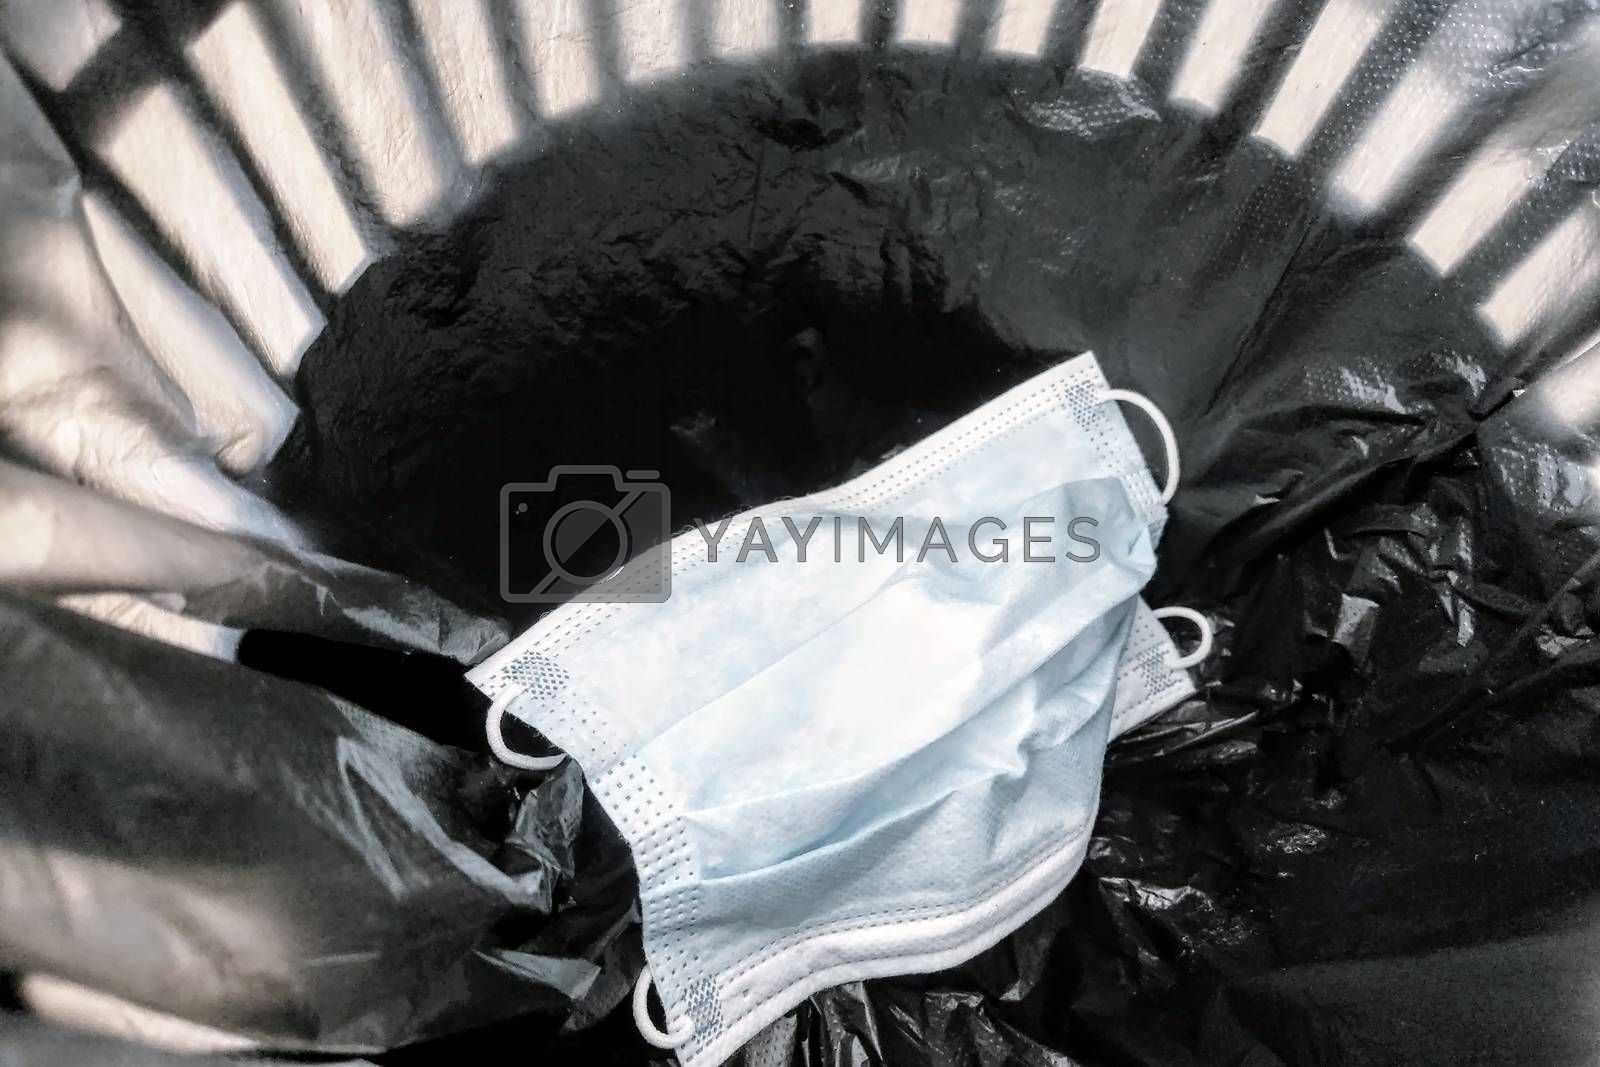 Used medical mask in the rubbish bin. Coronavirus protection